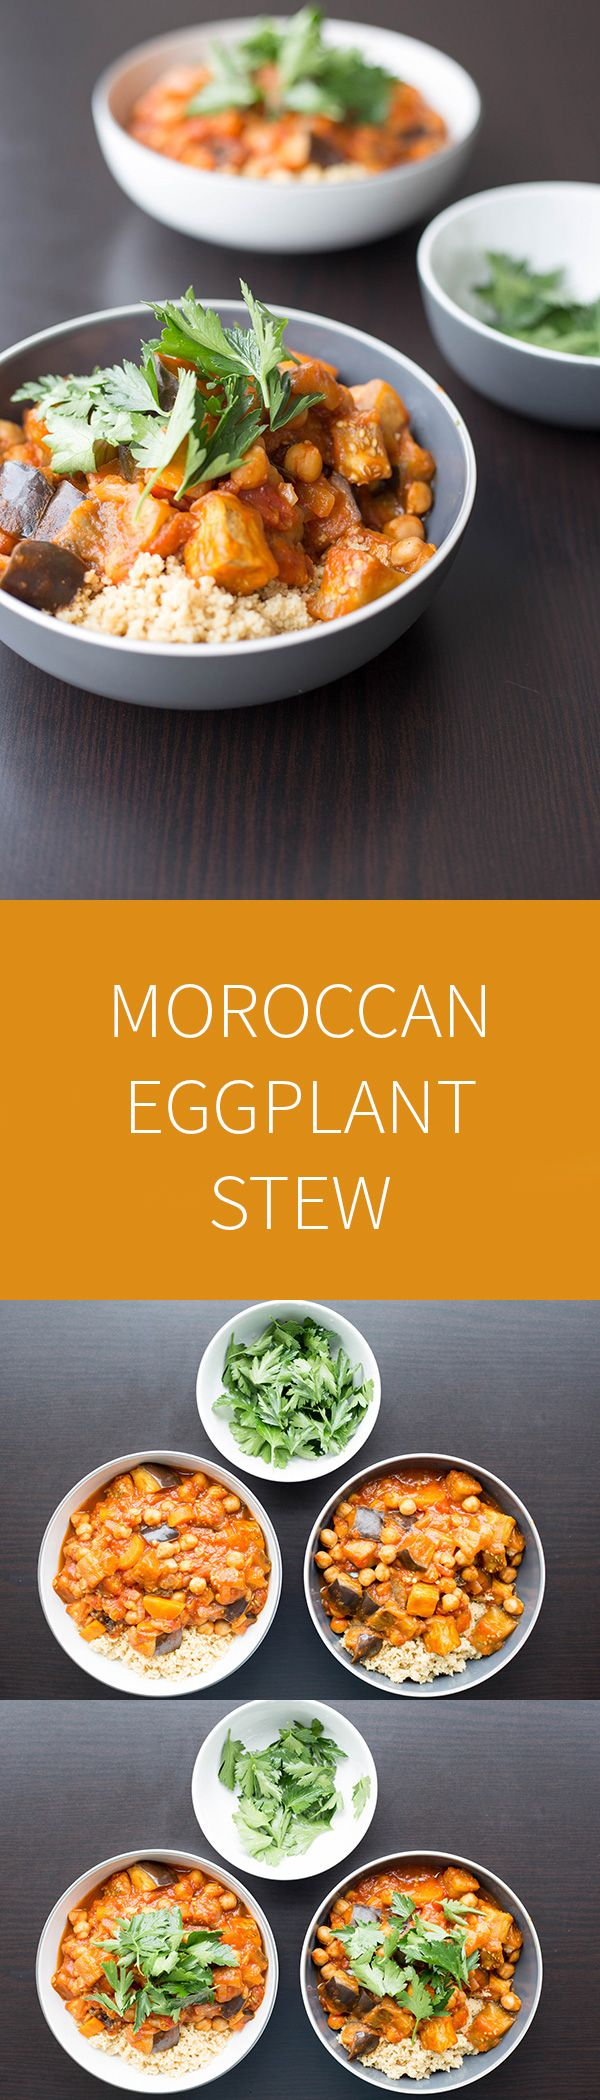 Moroccan Eggplant Stew                                                                                                                                                      More